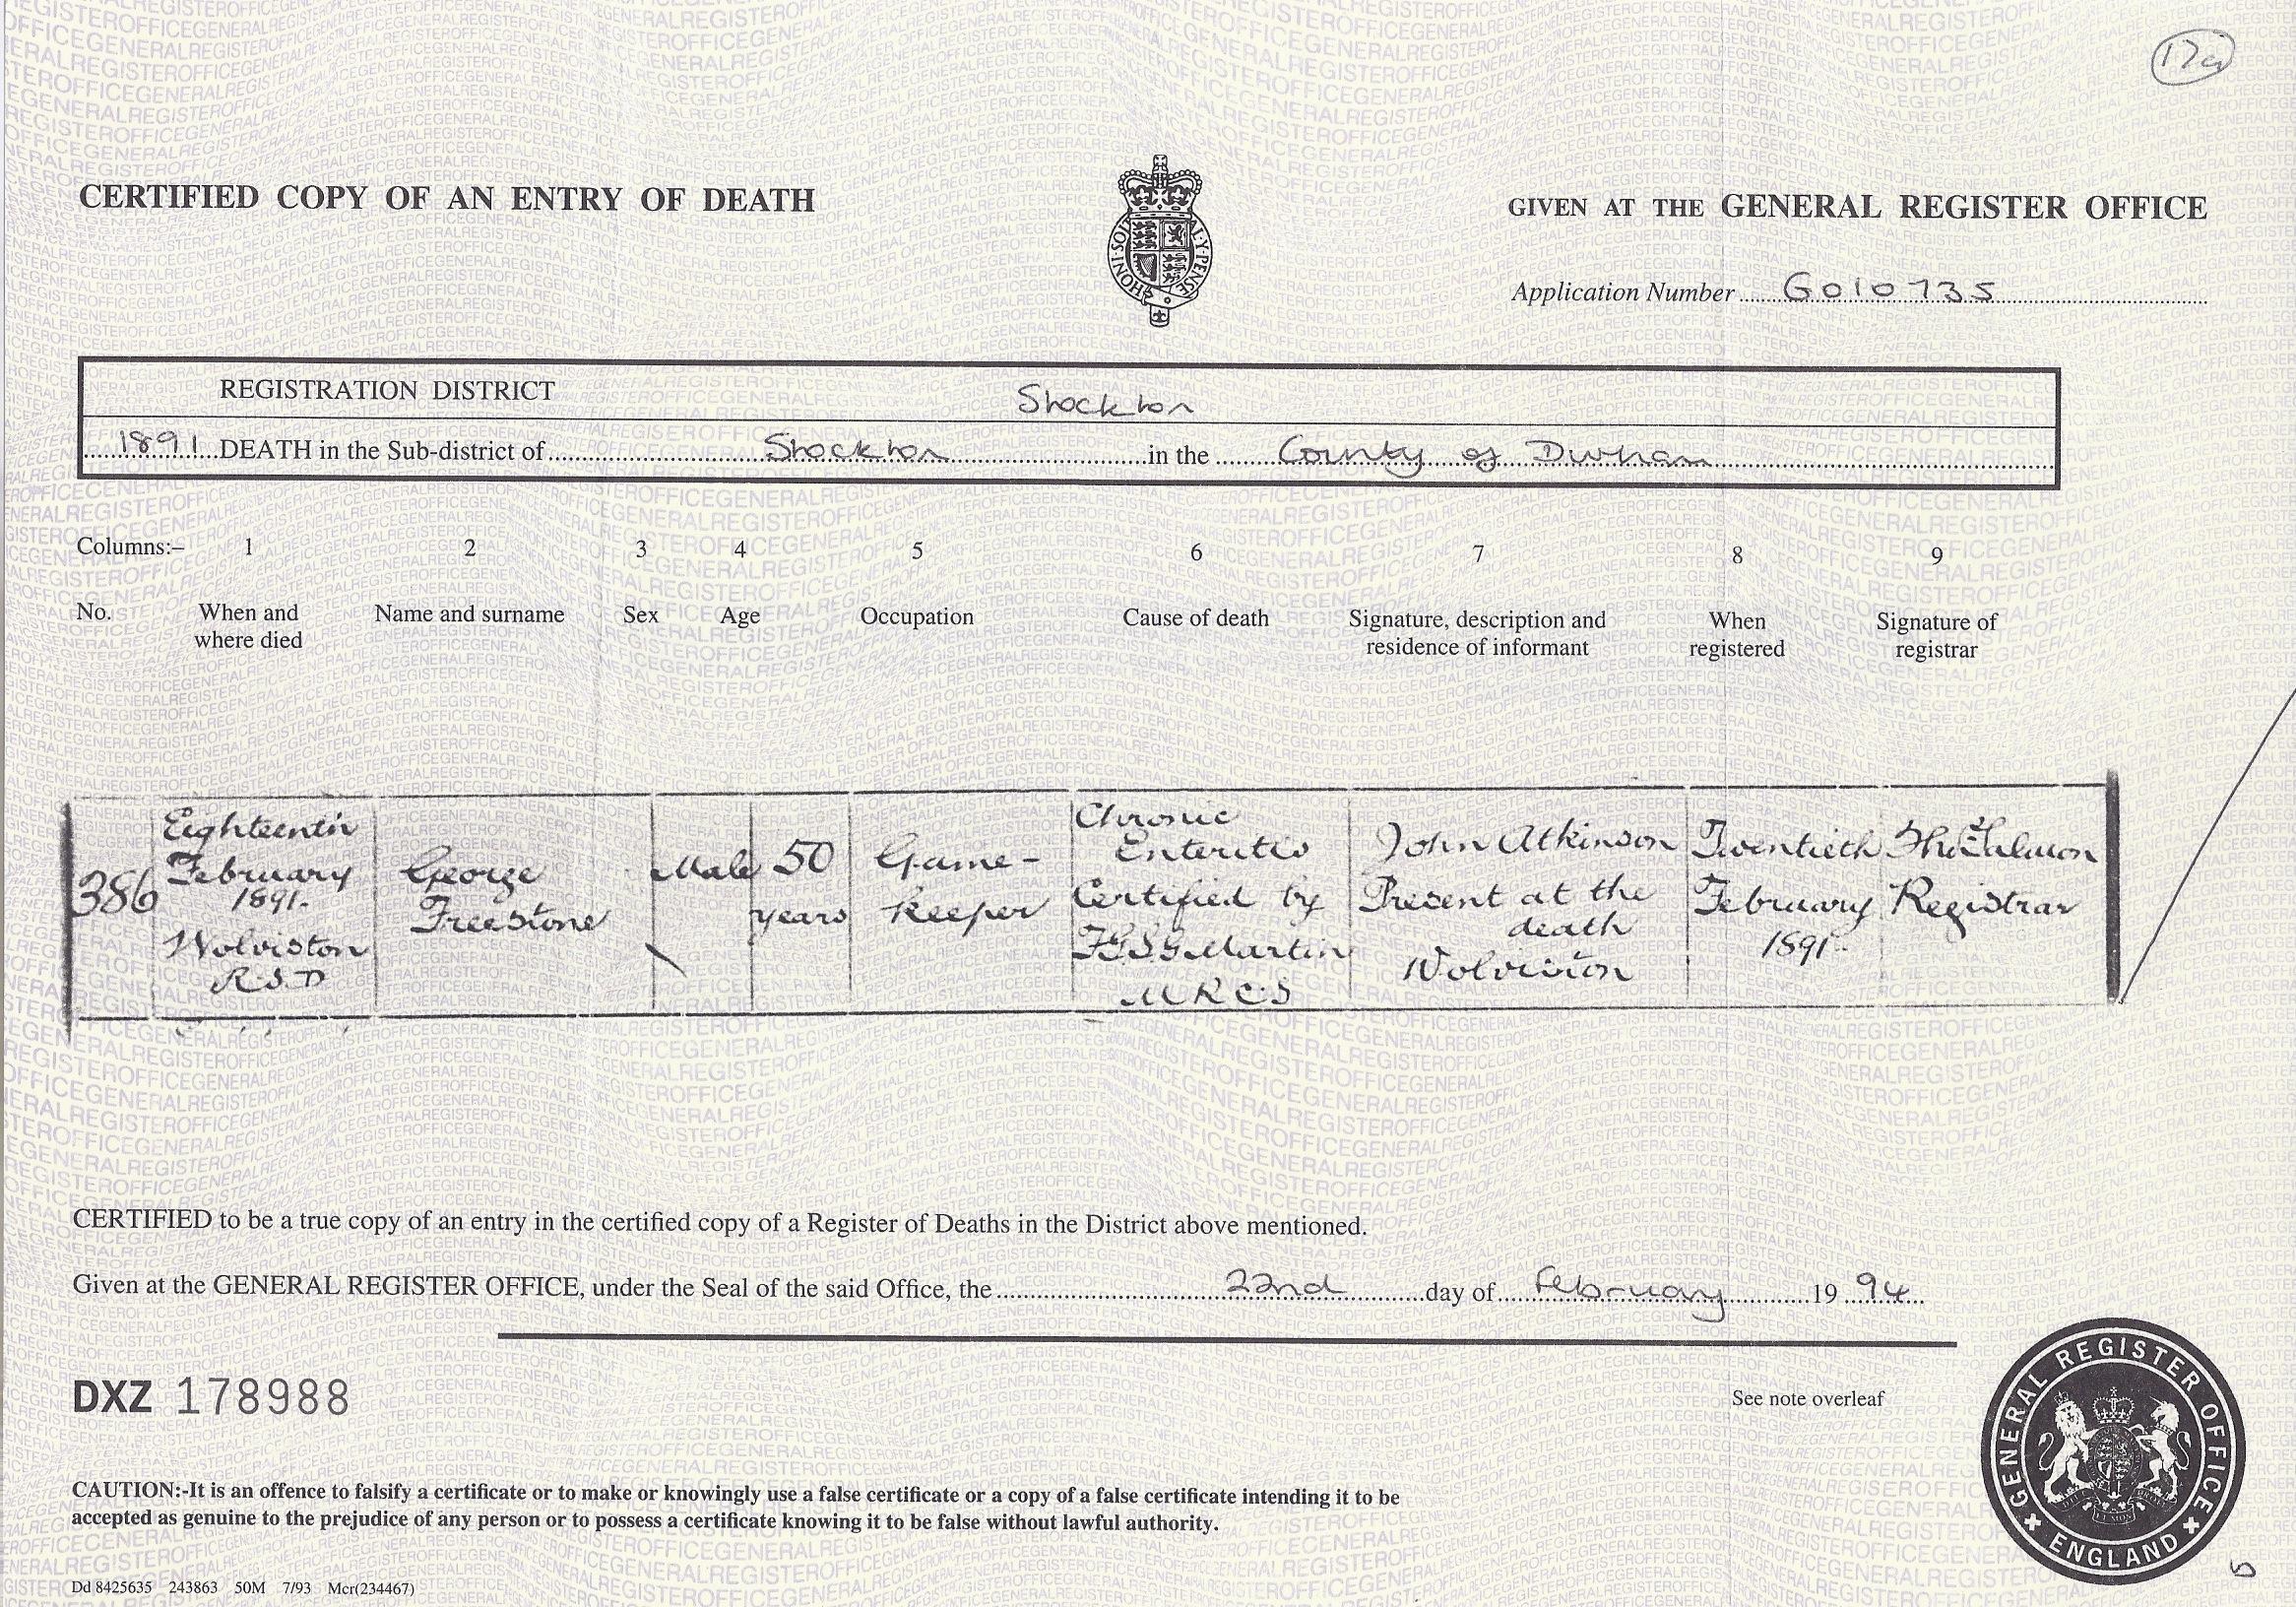 George Freestone's Death Certificate